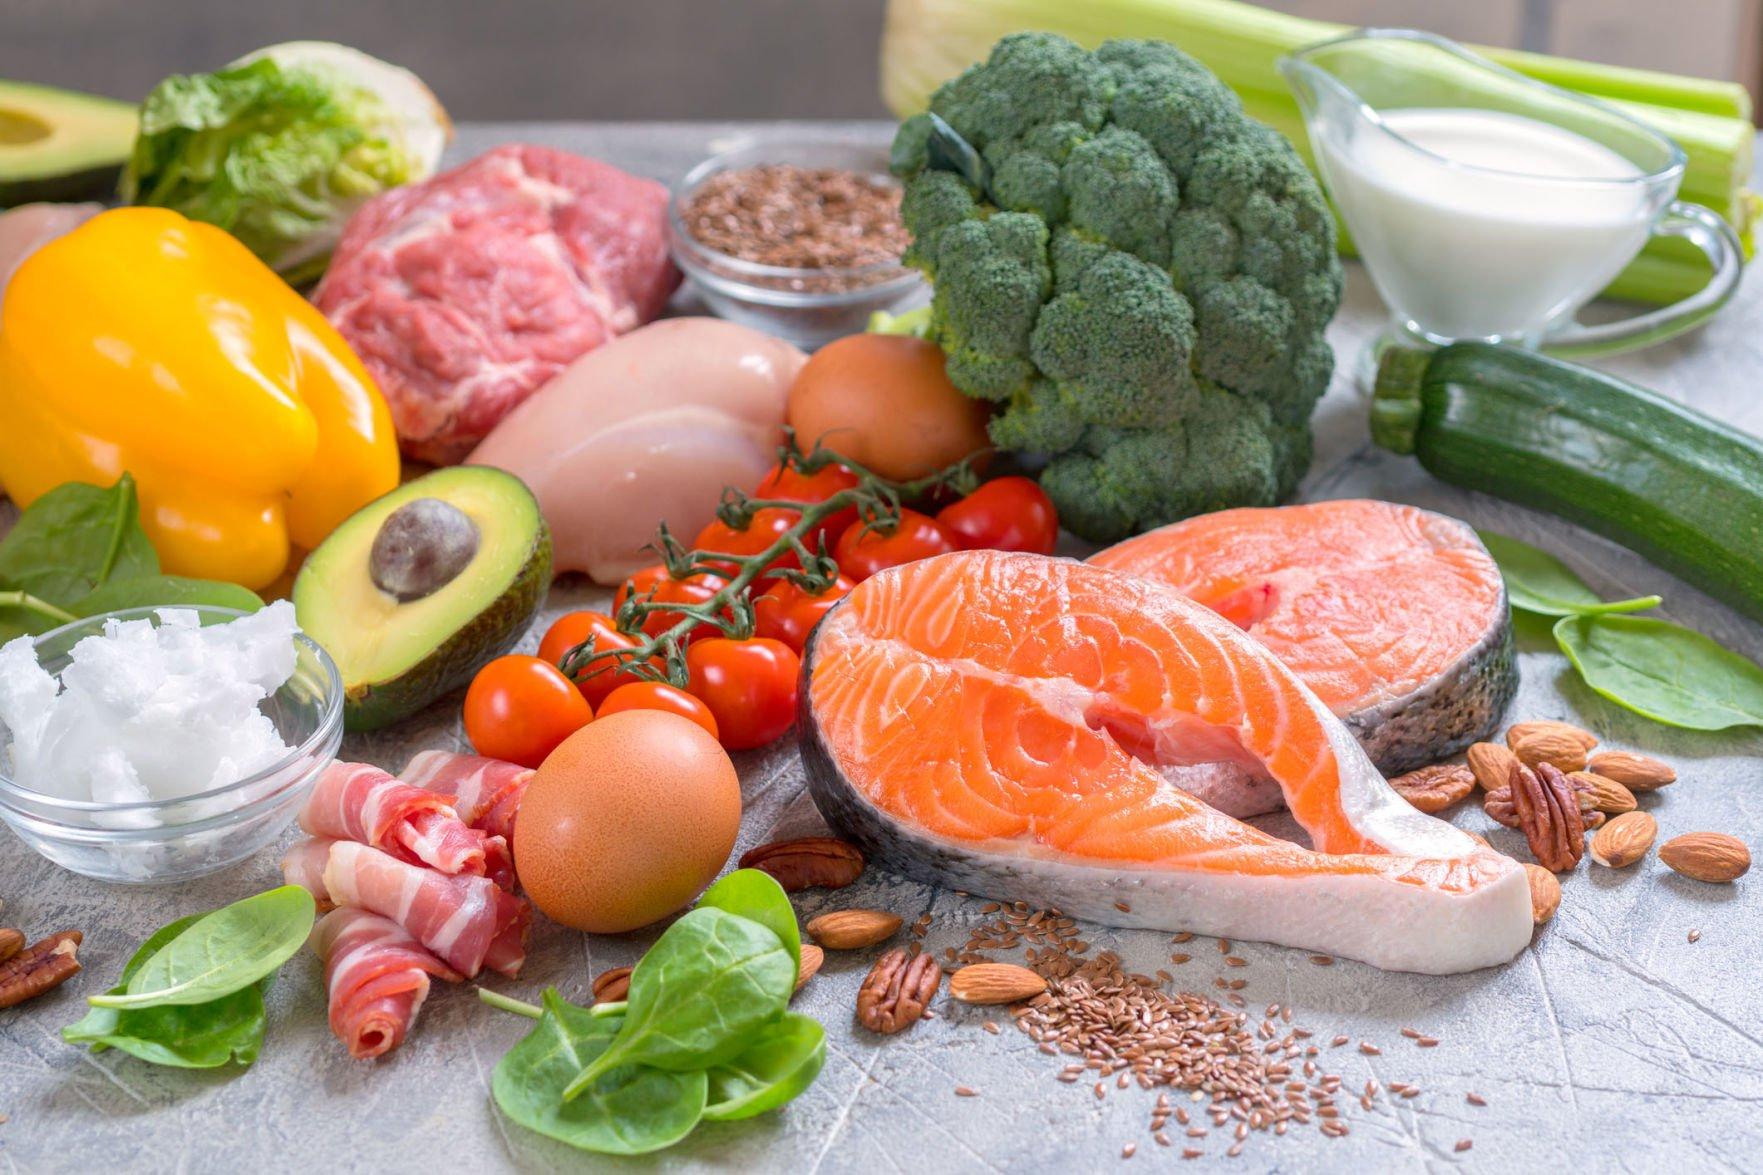 Vegetables carb diet keto low